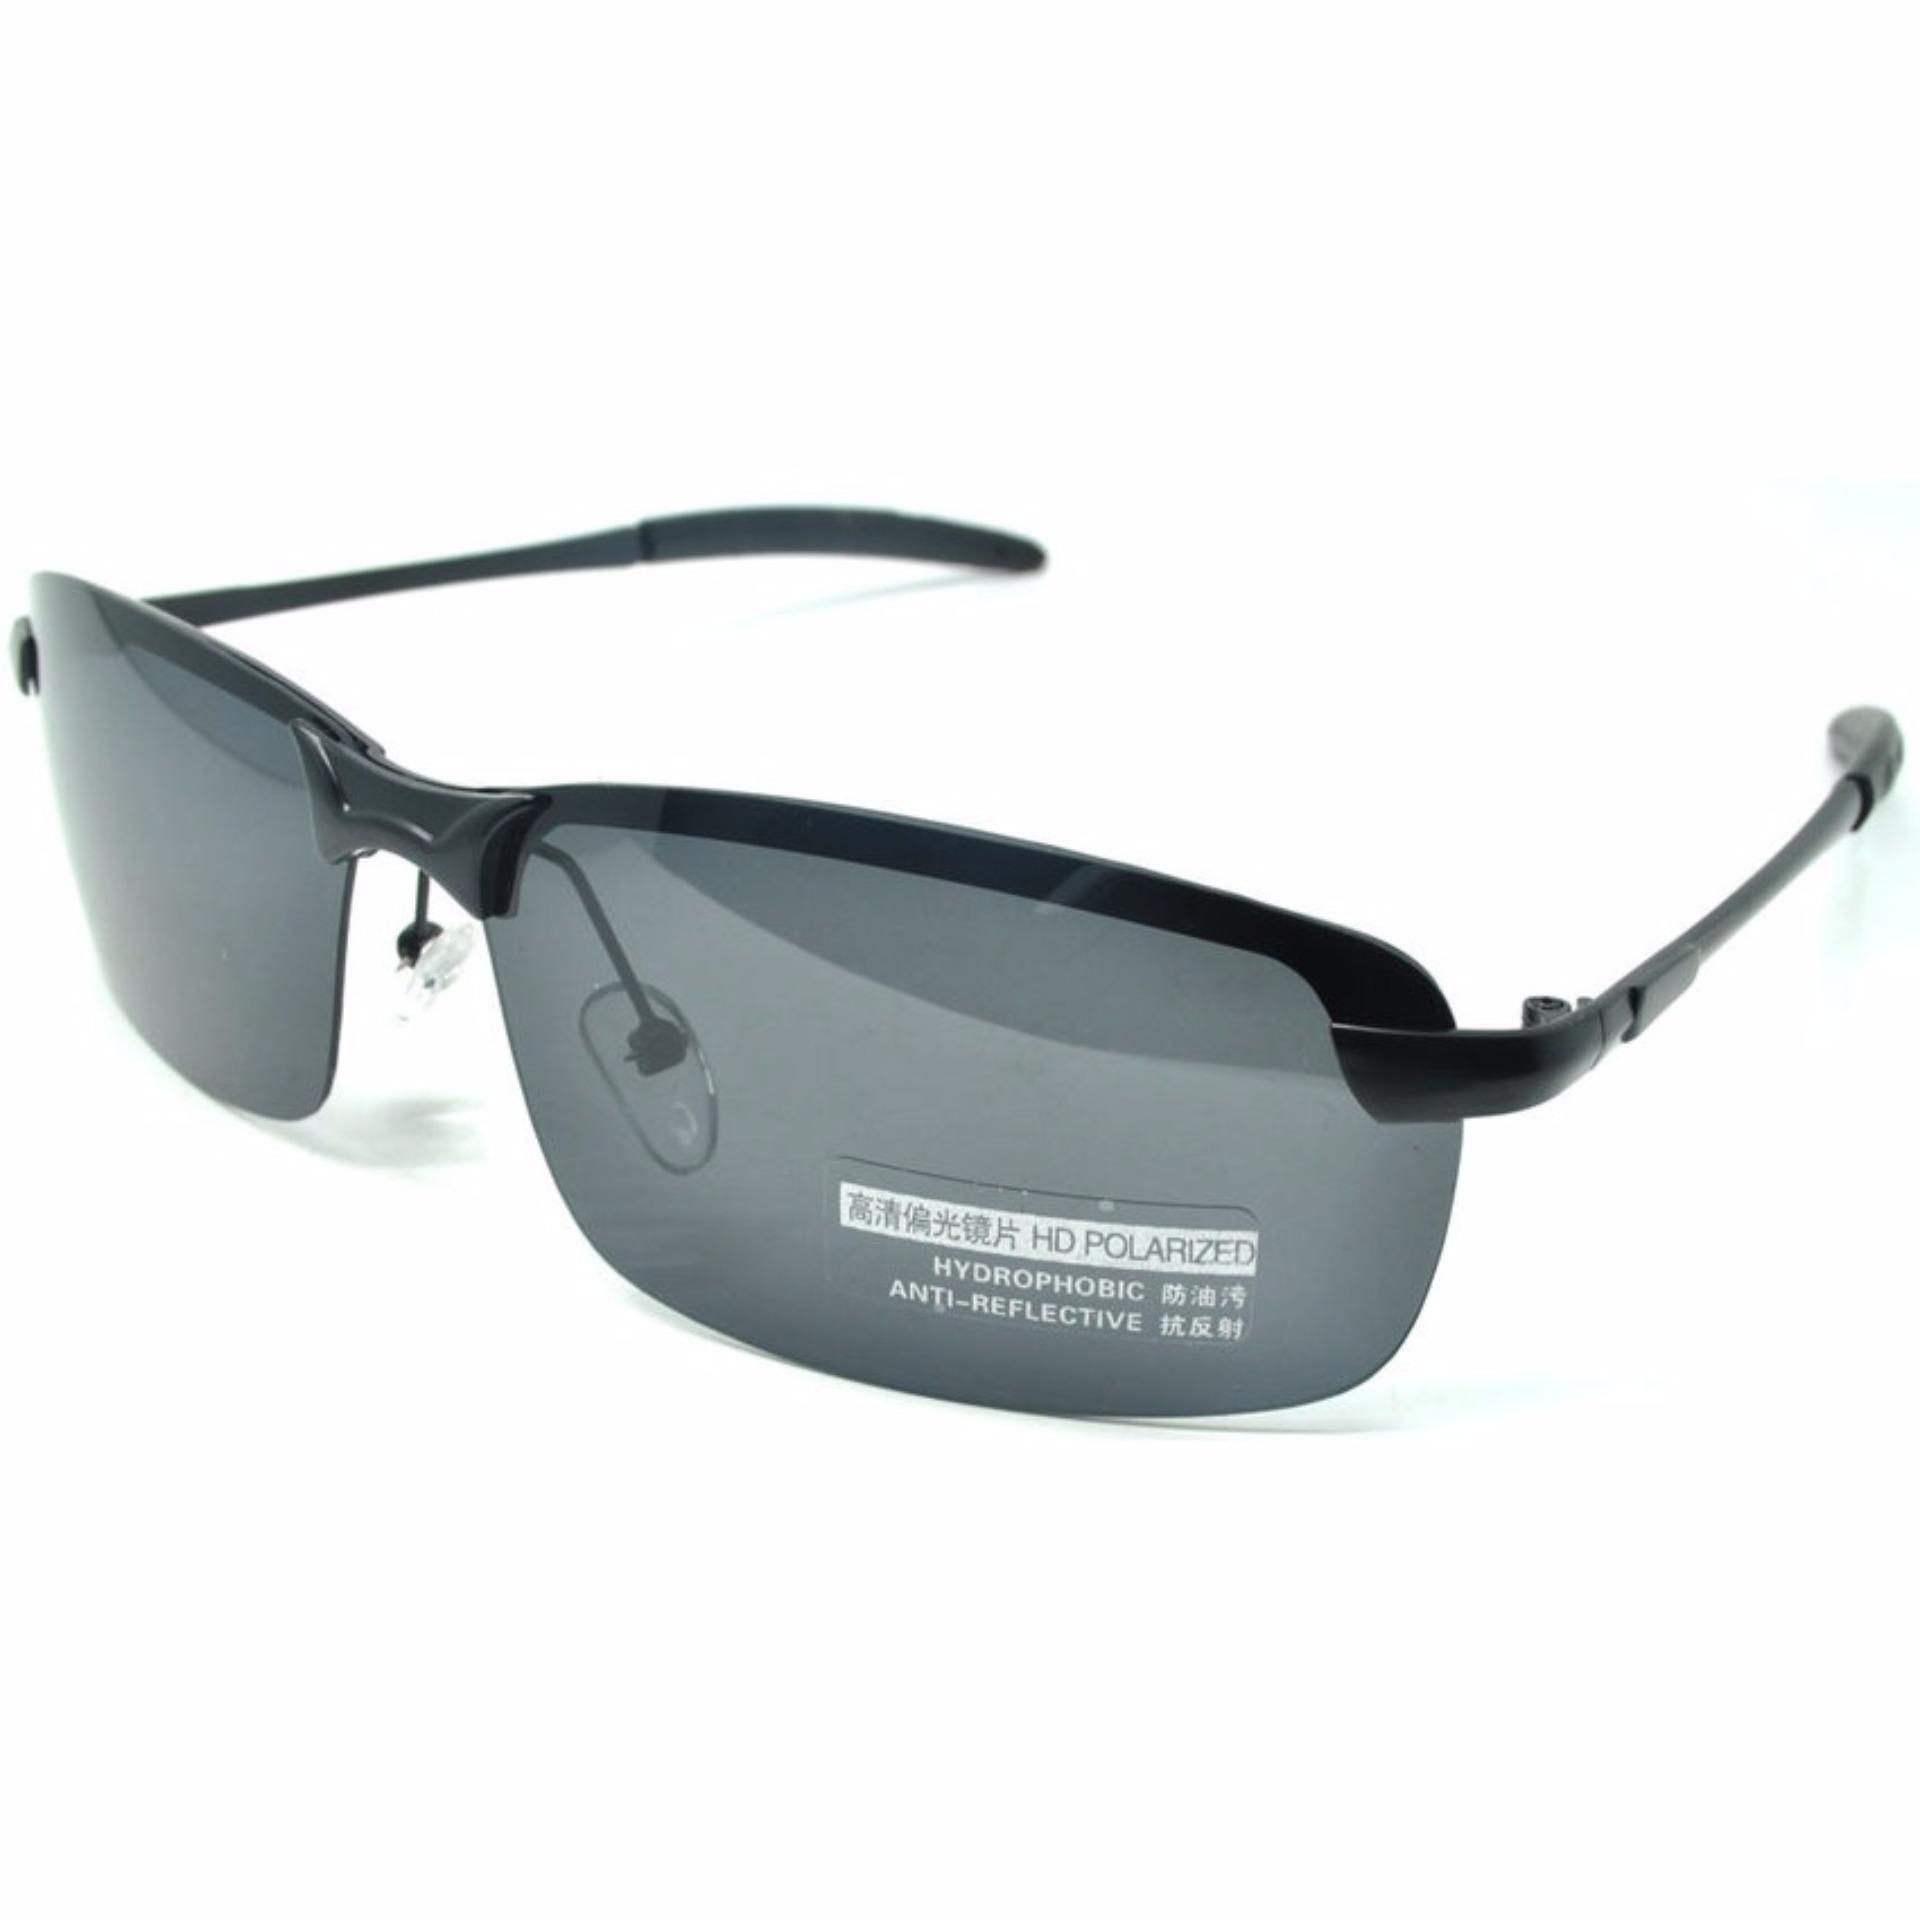 ... Kacamata Hitam Polarized Sunglasses untuk Pria Wanita Fashion Outdoor  Accessories - 3403 - Hitam b386368e99